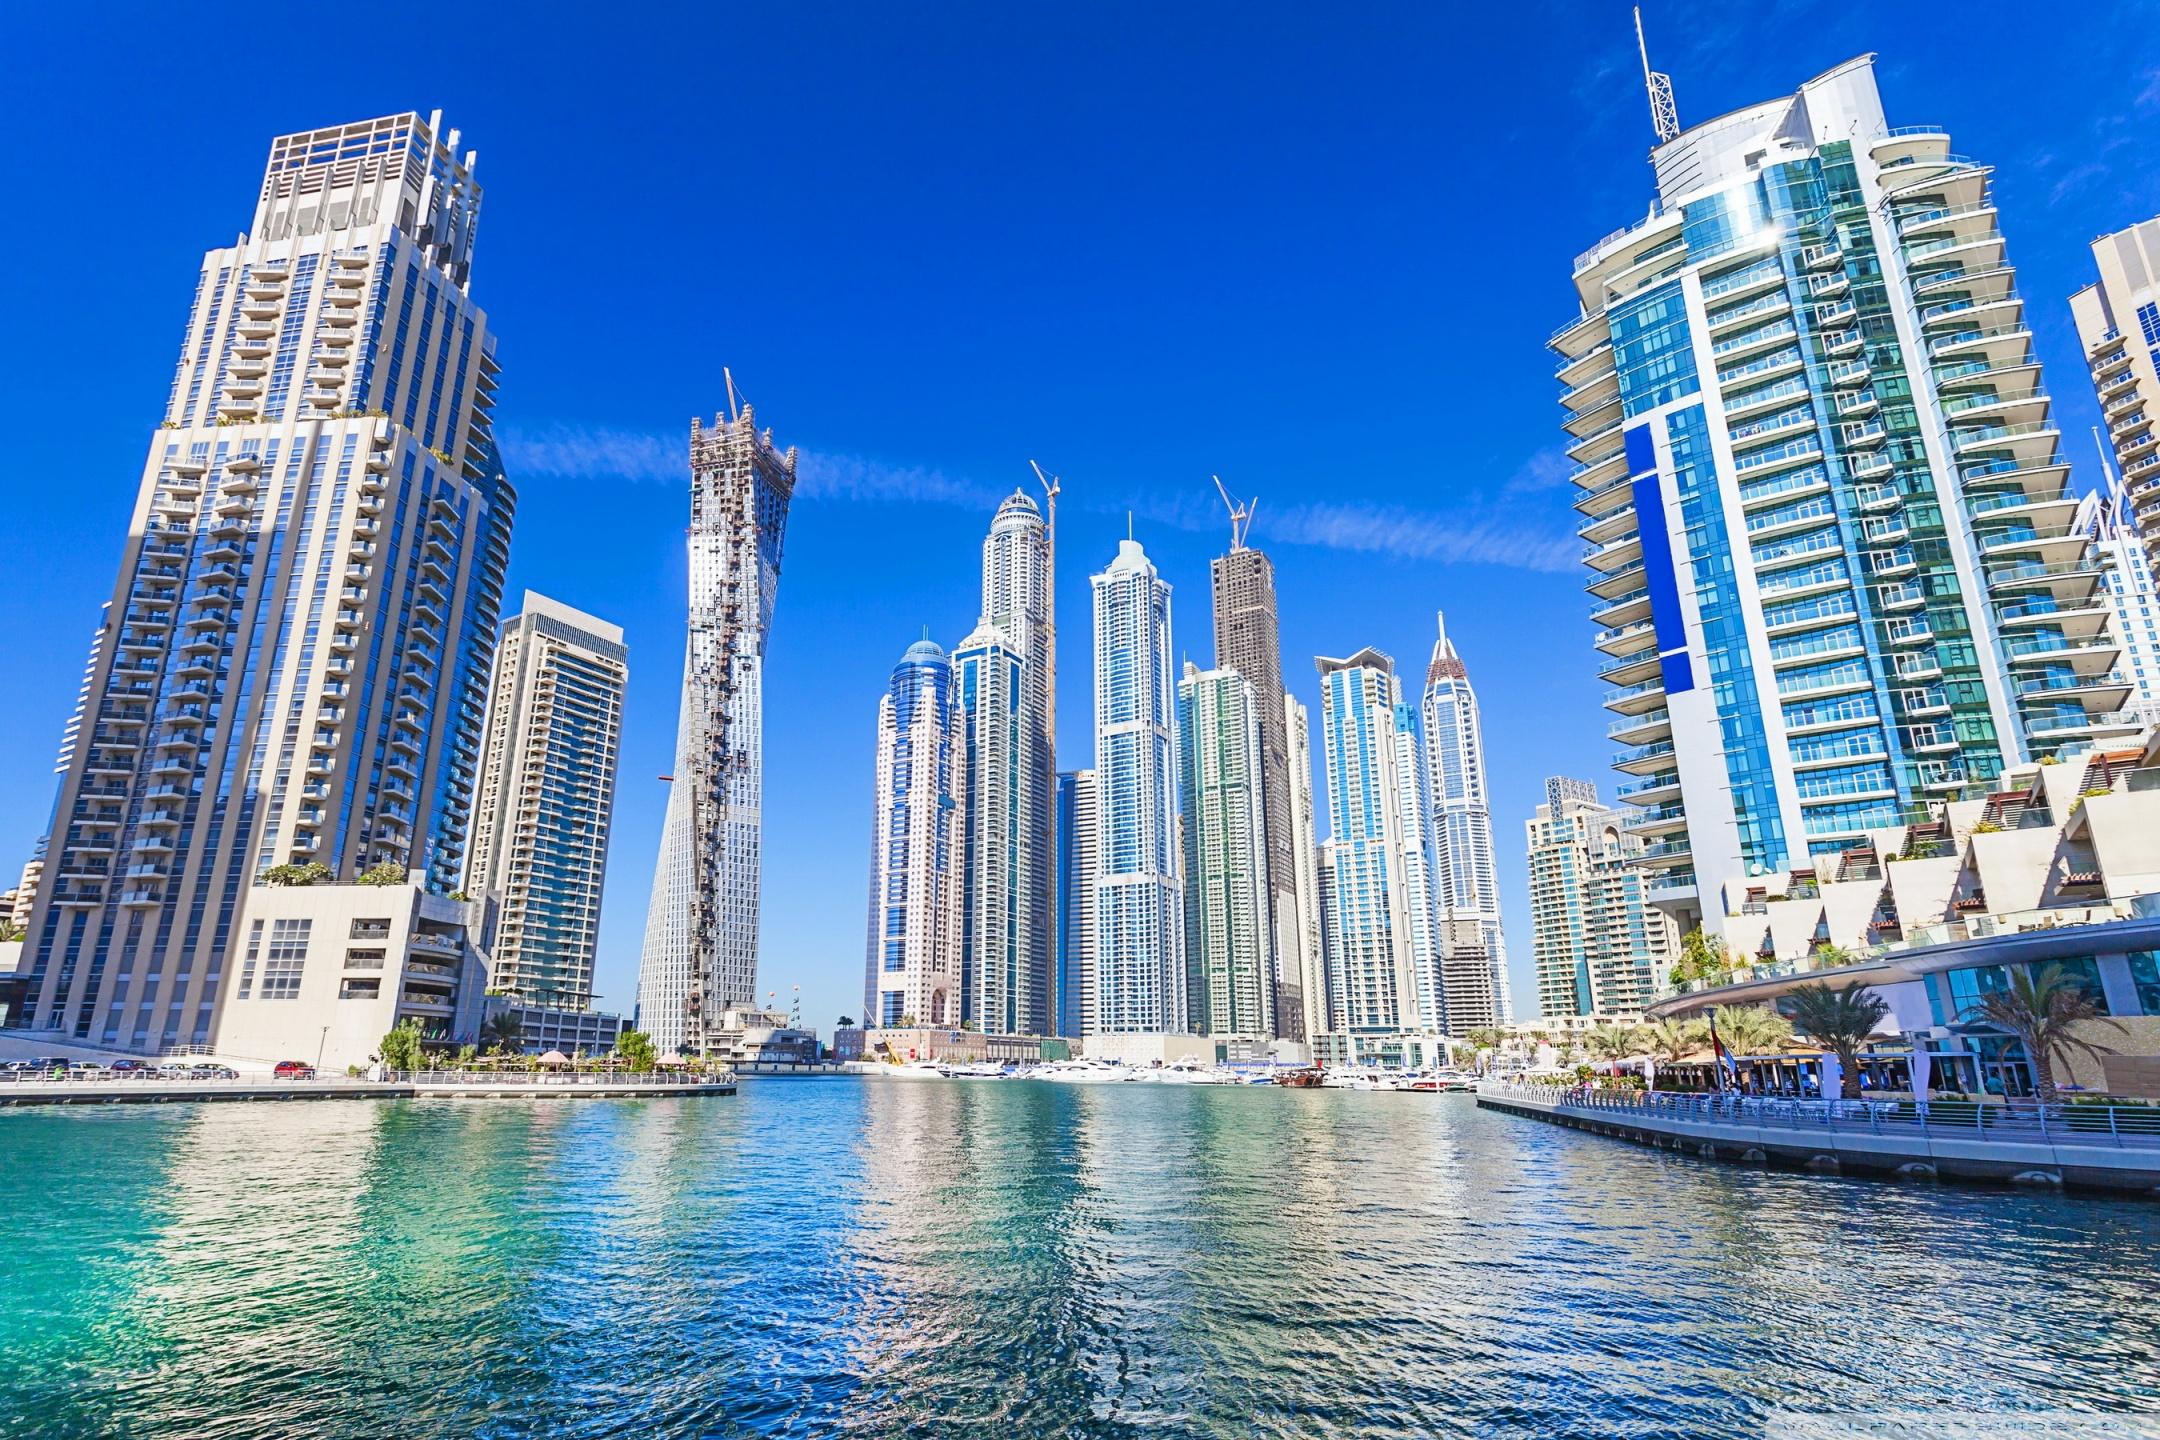 Dubai United Arab Emirates Skyscrapers 4K HD Desktop 2160x1440